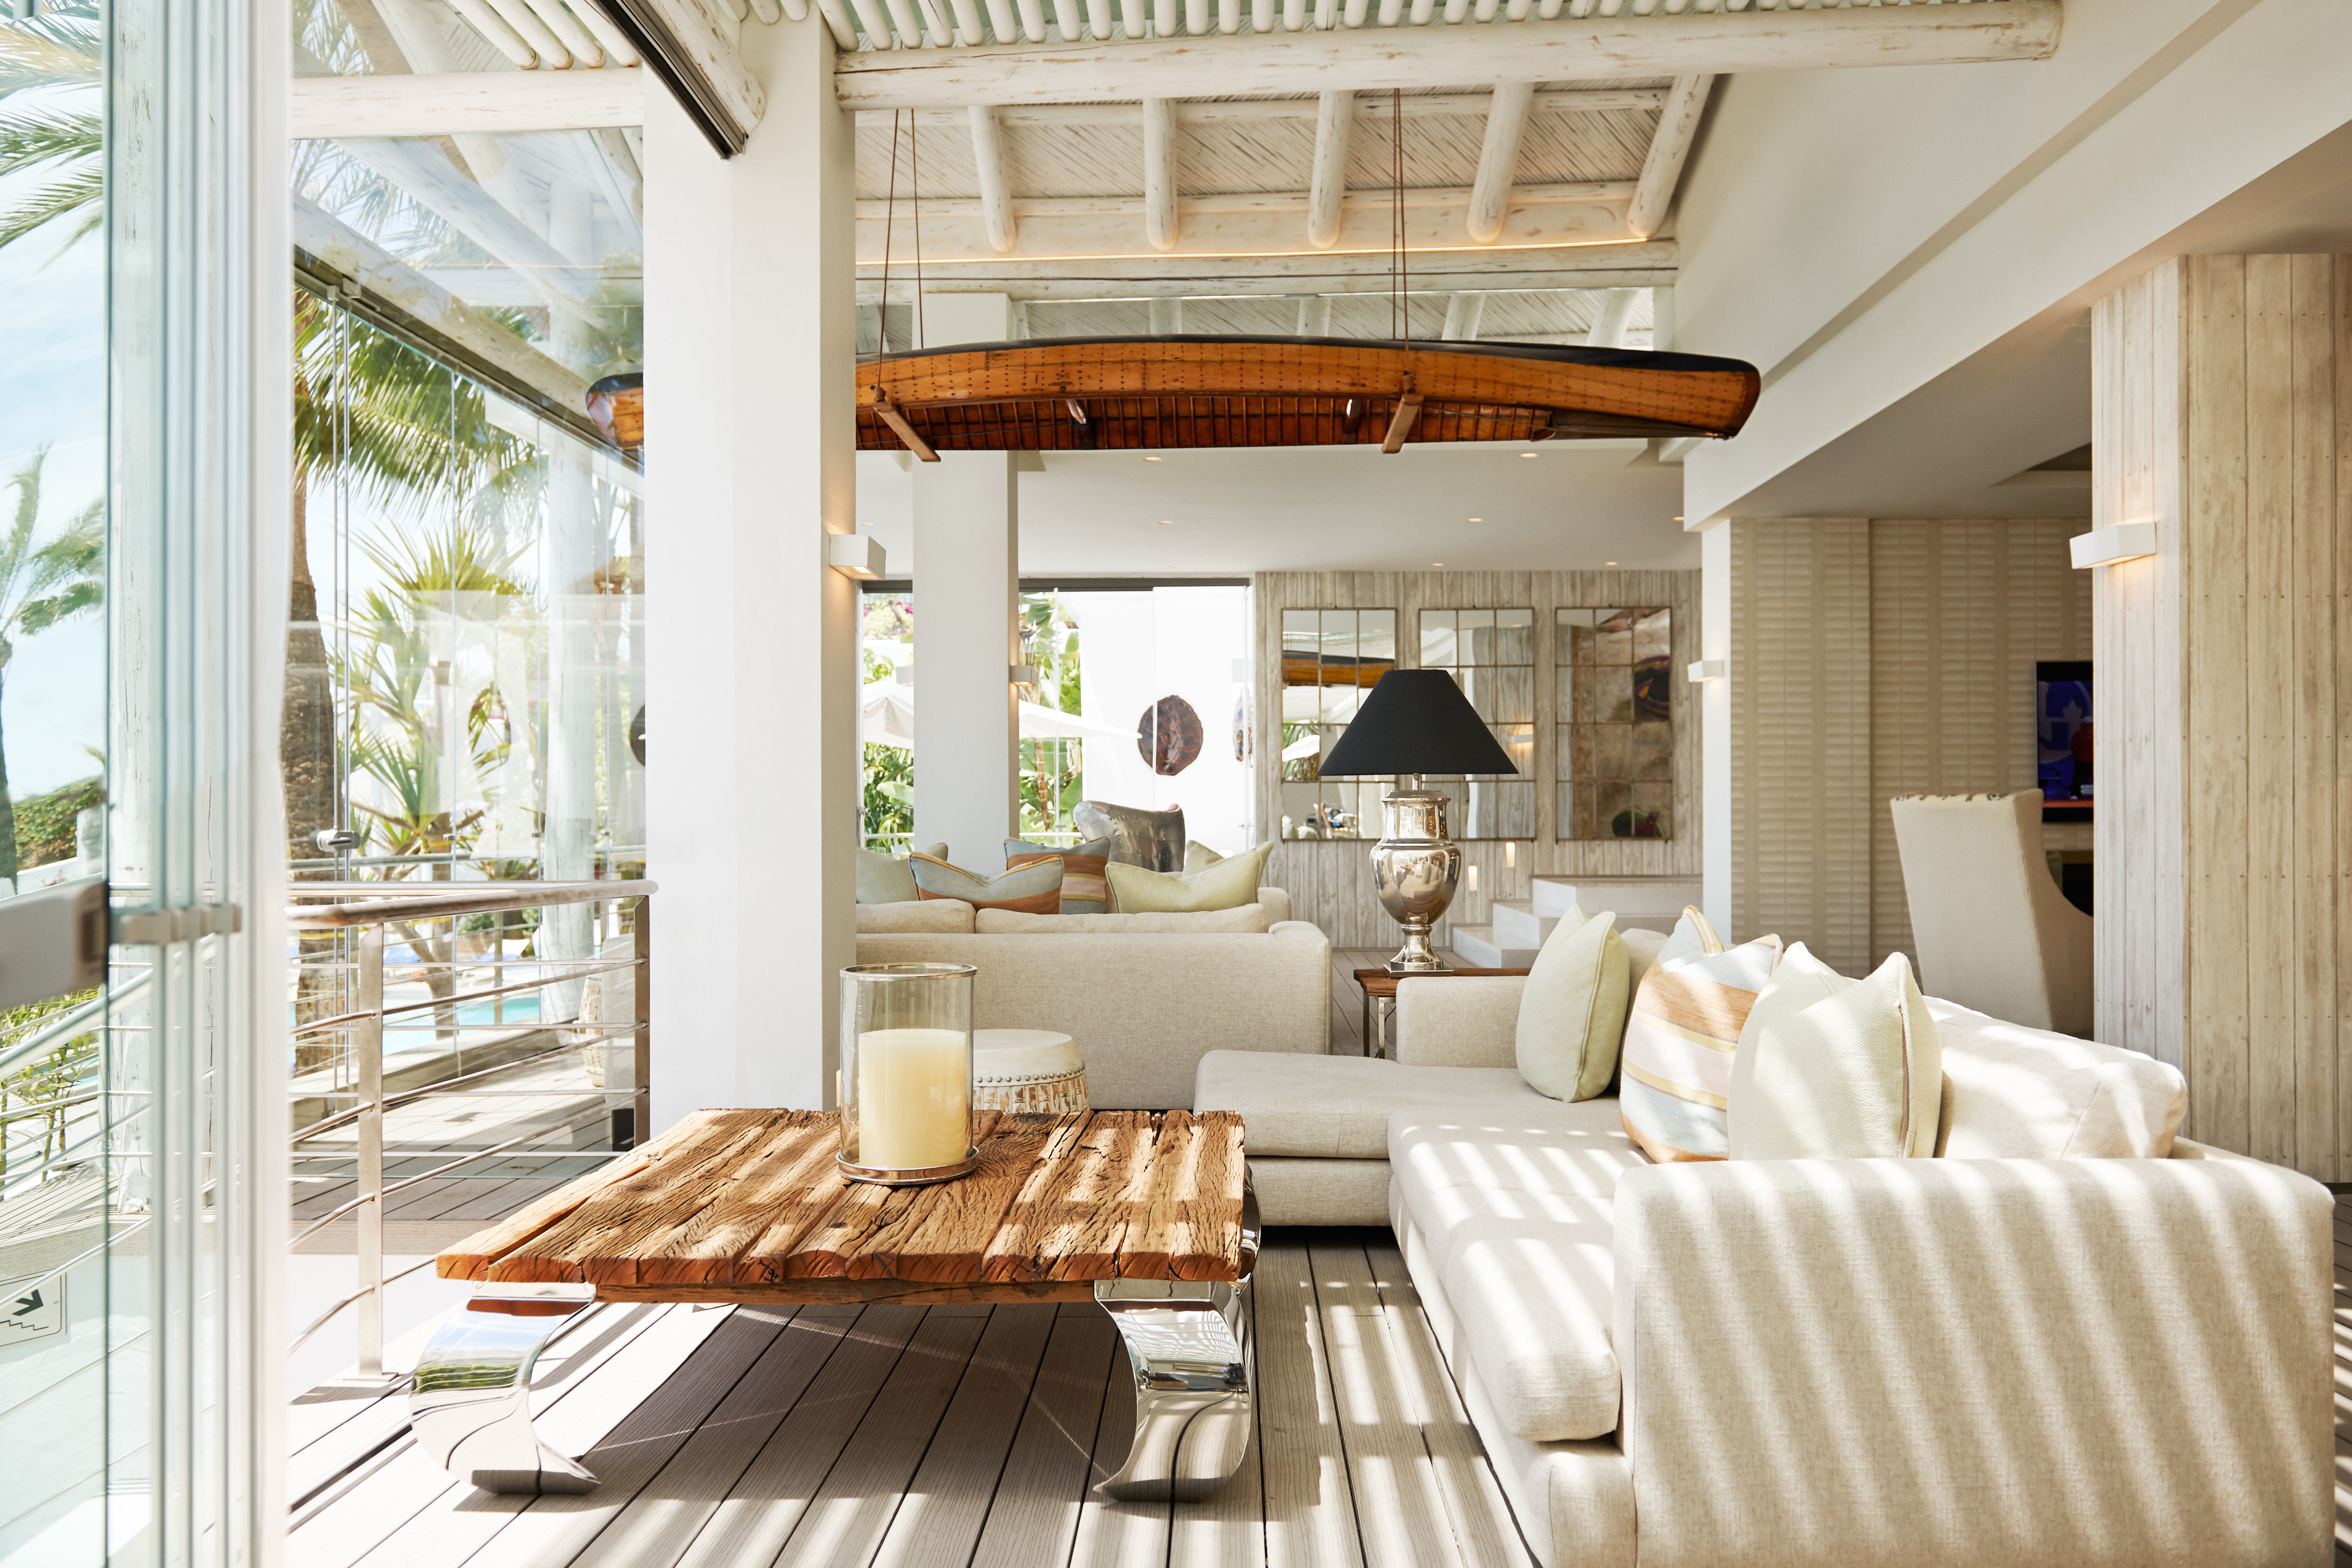 Beachfront Hip Lounge Luxury Modern Scenic views property living room home porch cottage farmhouse Villa mansion condominium outdoor structure